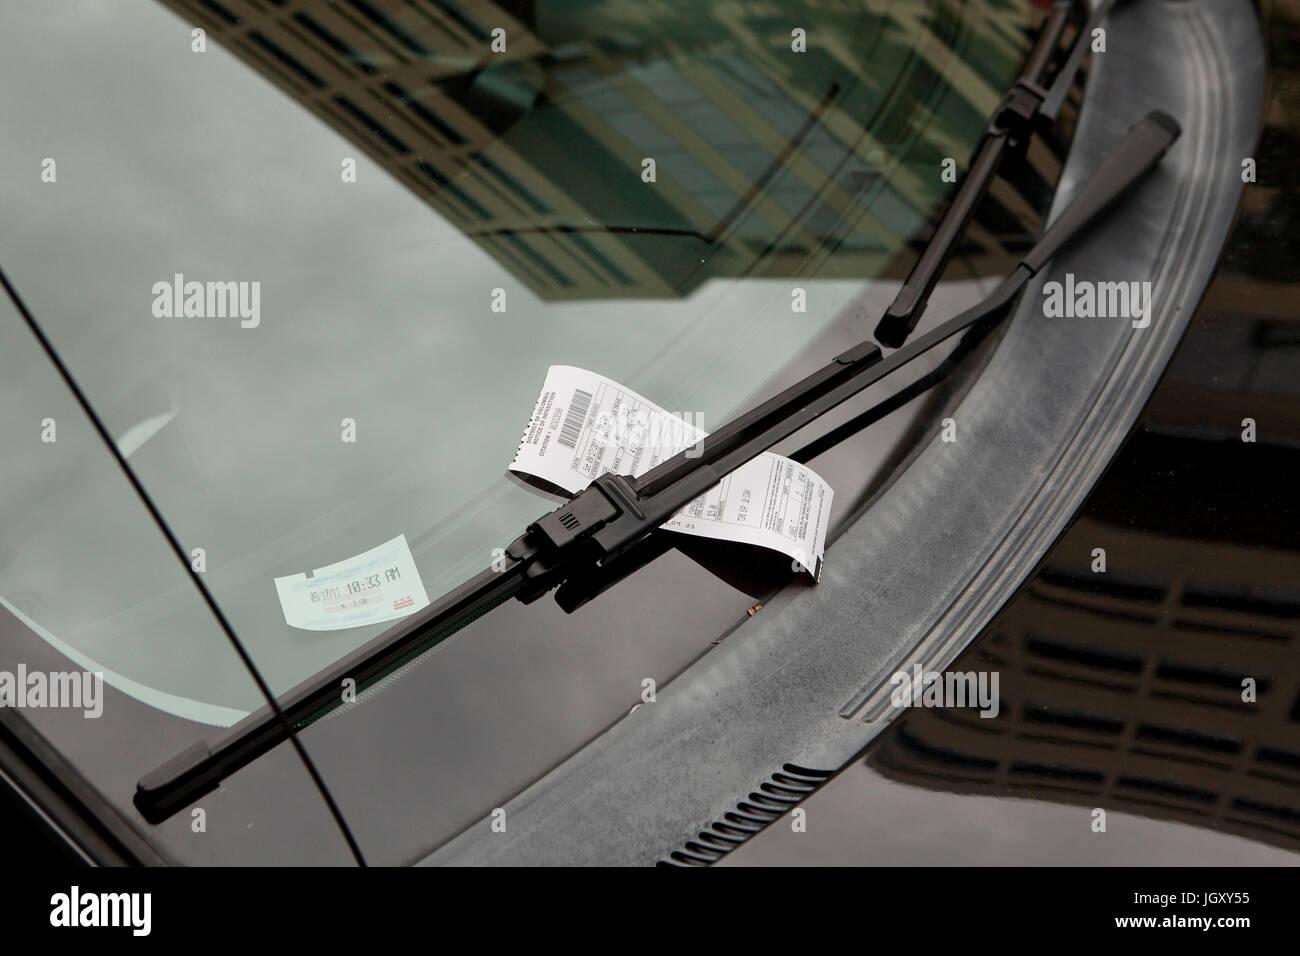 Parking violation ticket on windshield - USA - Stock Image